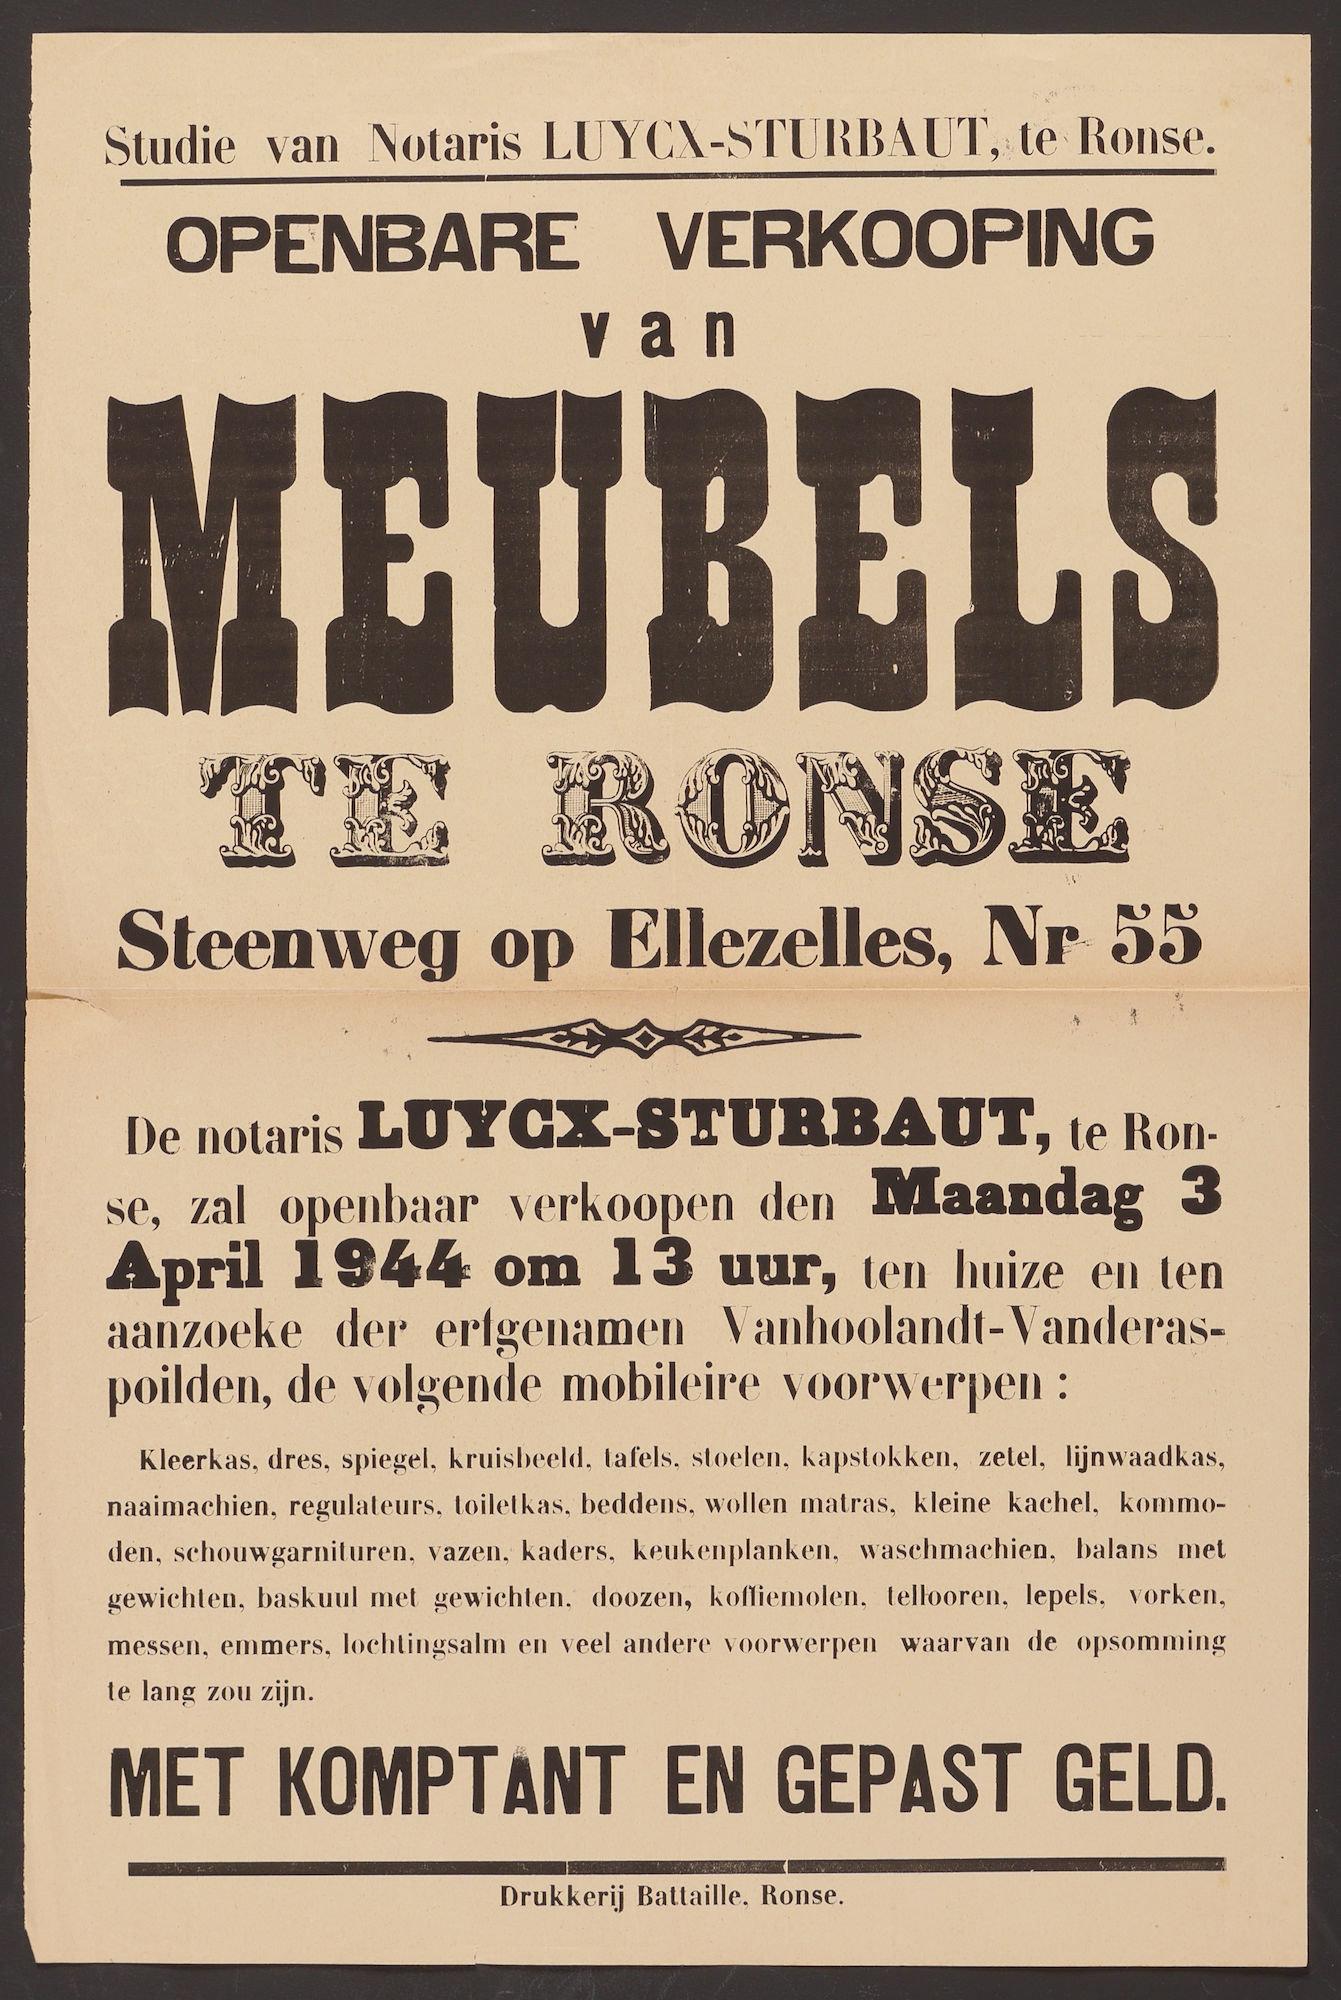 Affiche betreffende openbare verkoping van meubels